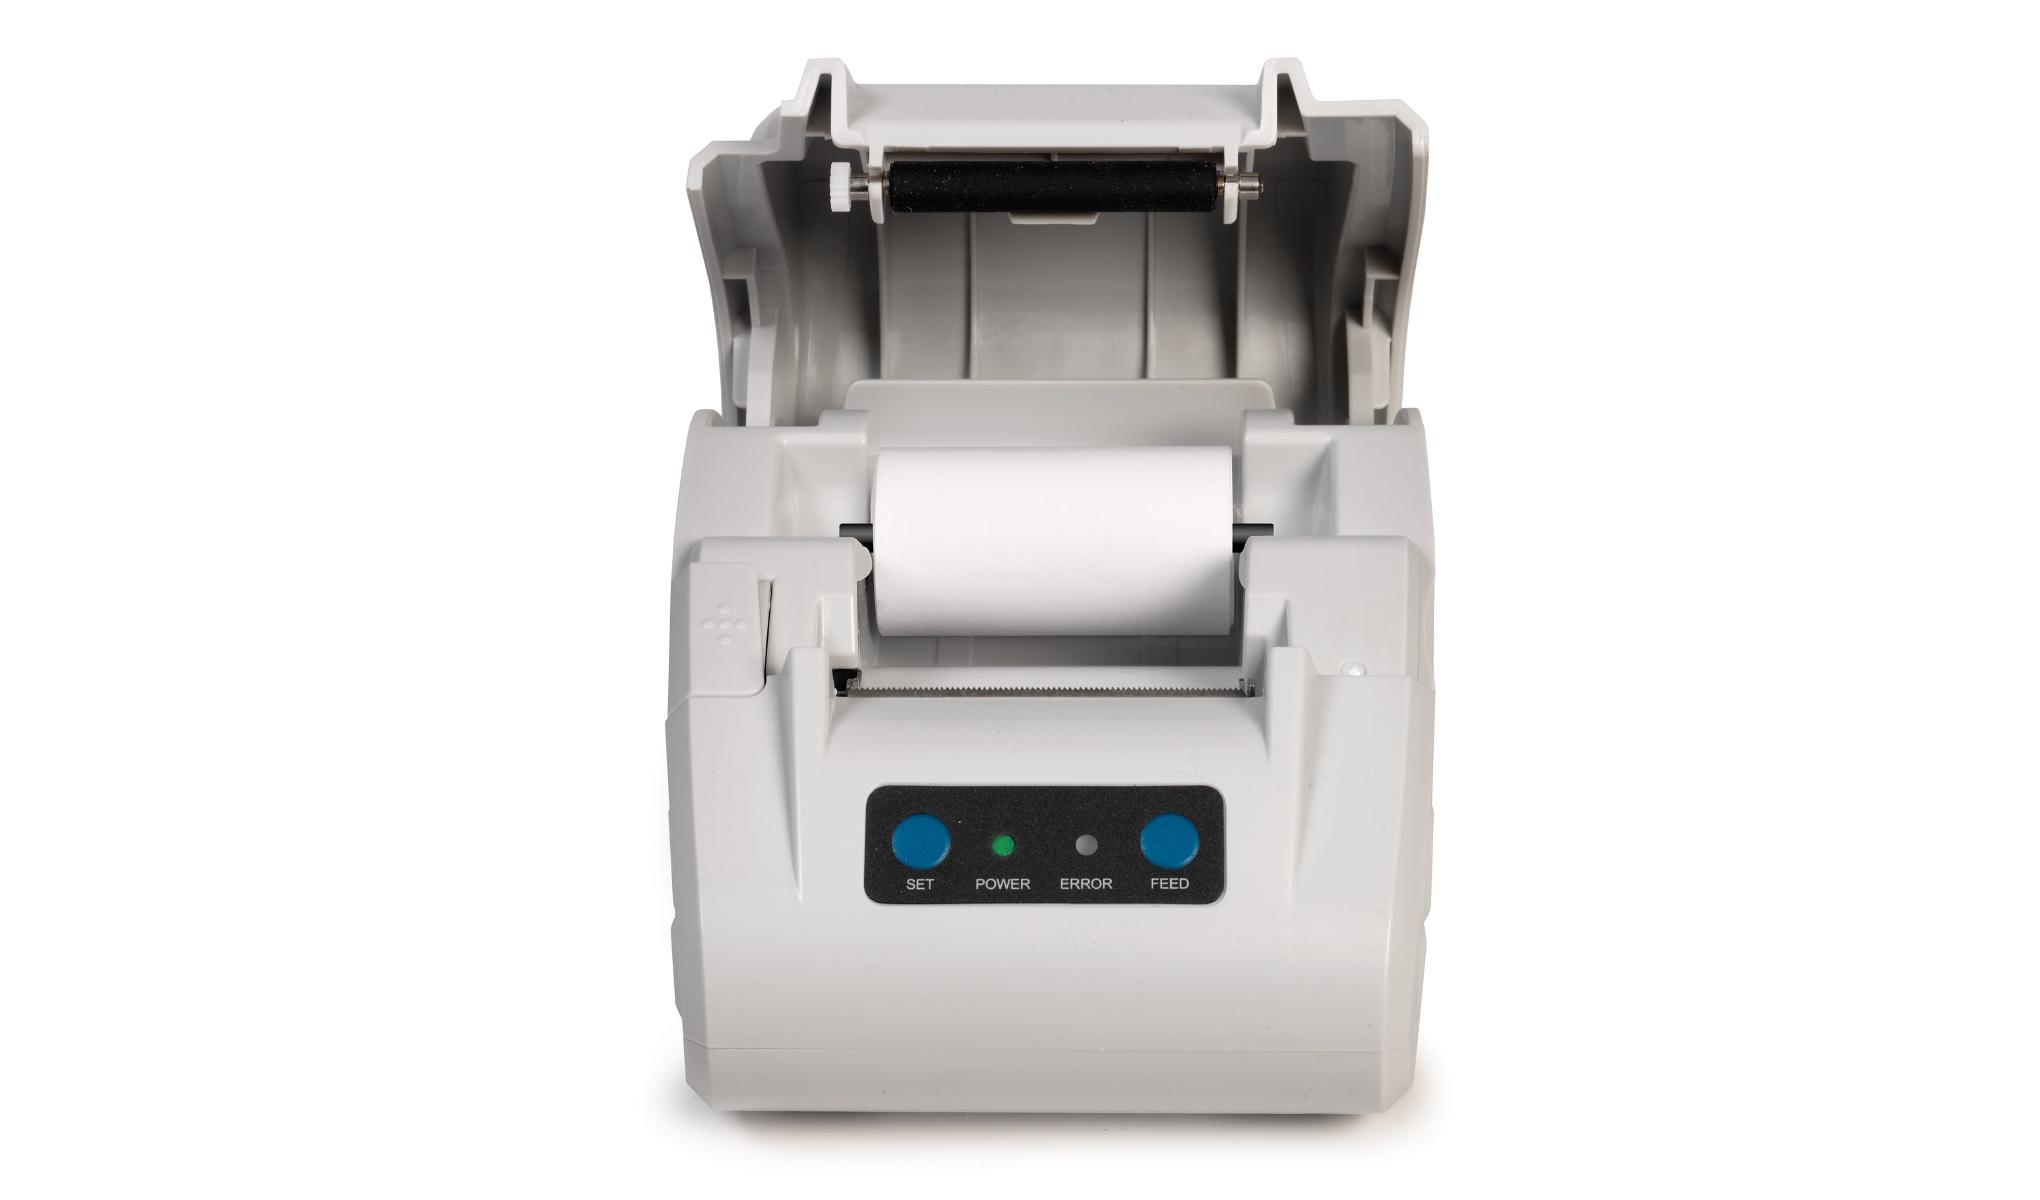 safescan-tp-230-papier-do-druku-termicznego